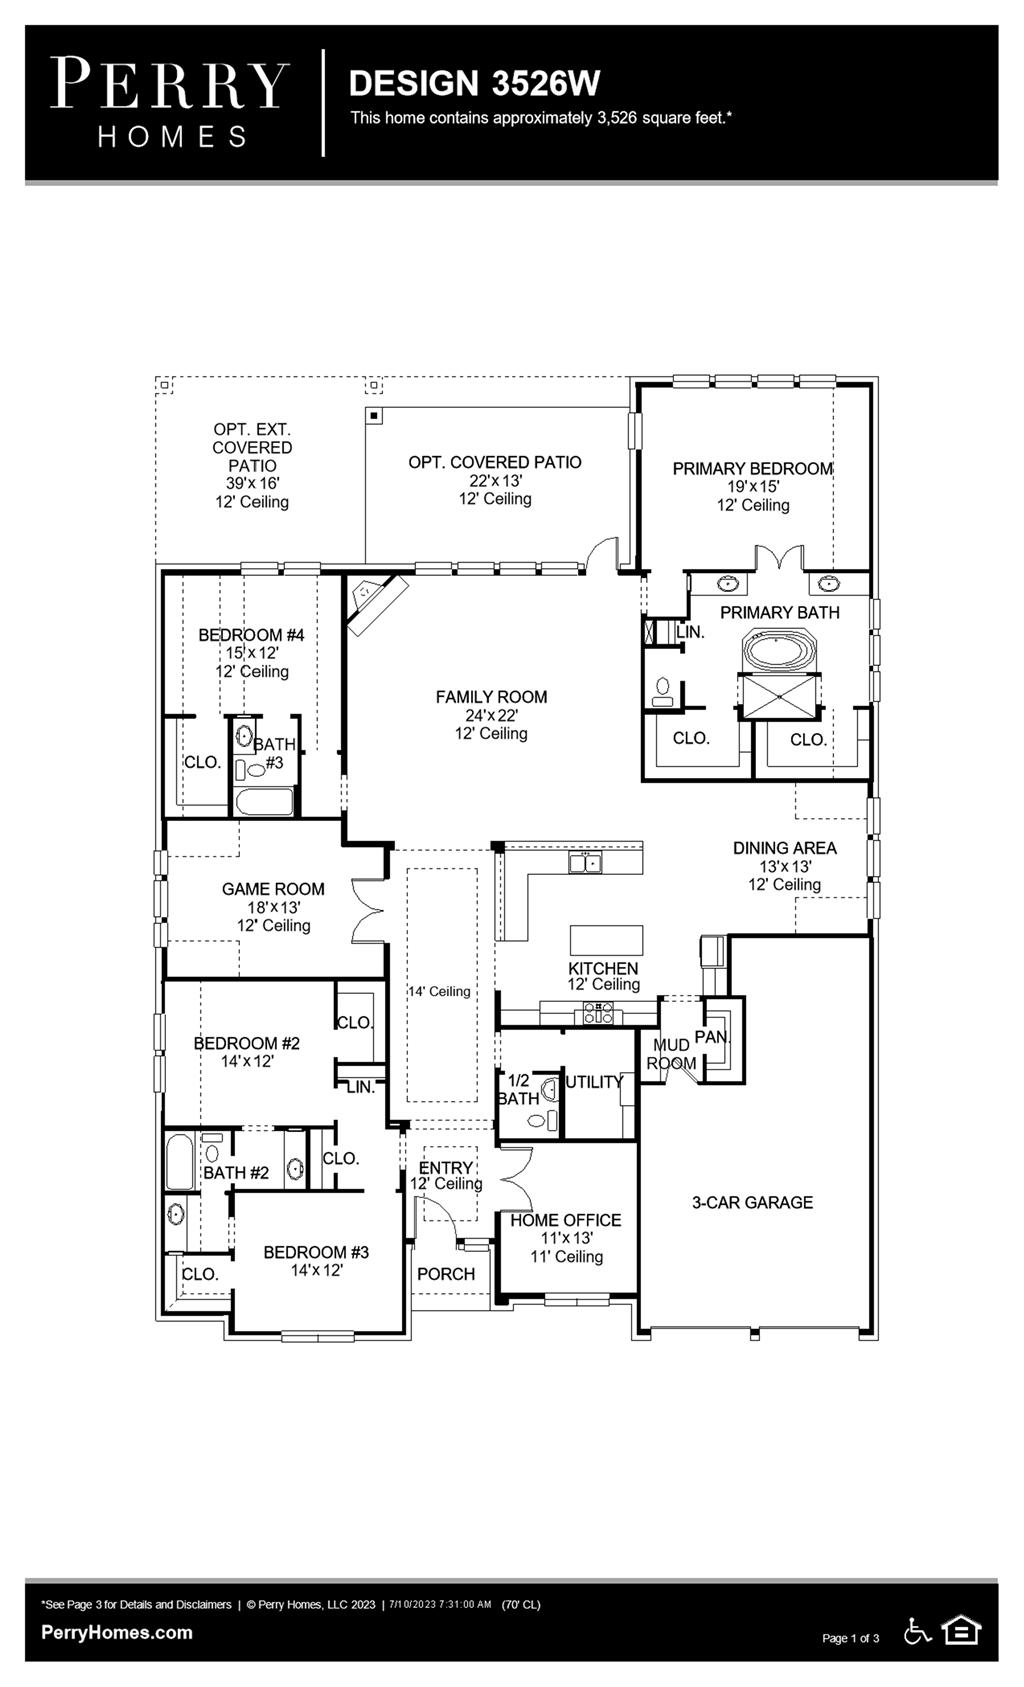 Floor Plan for 3526W